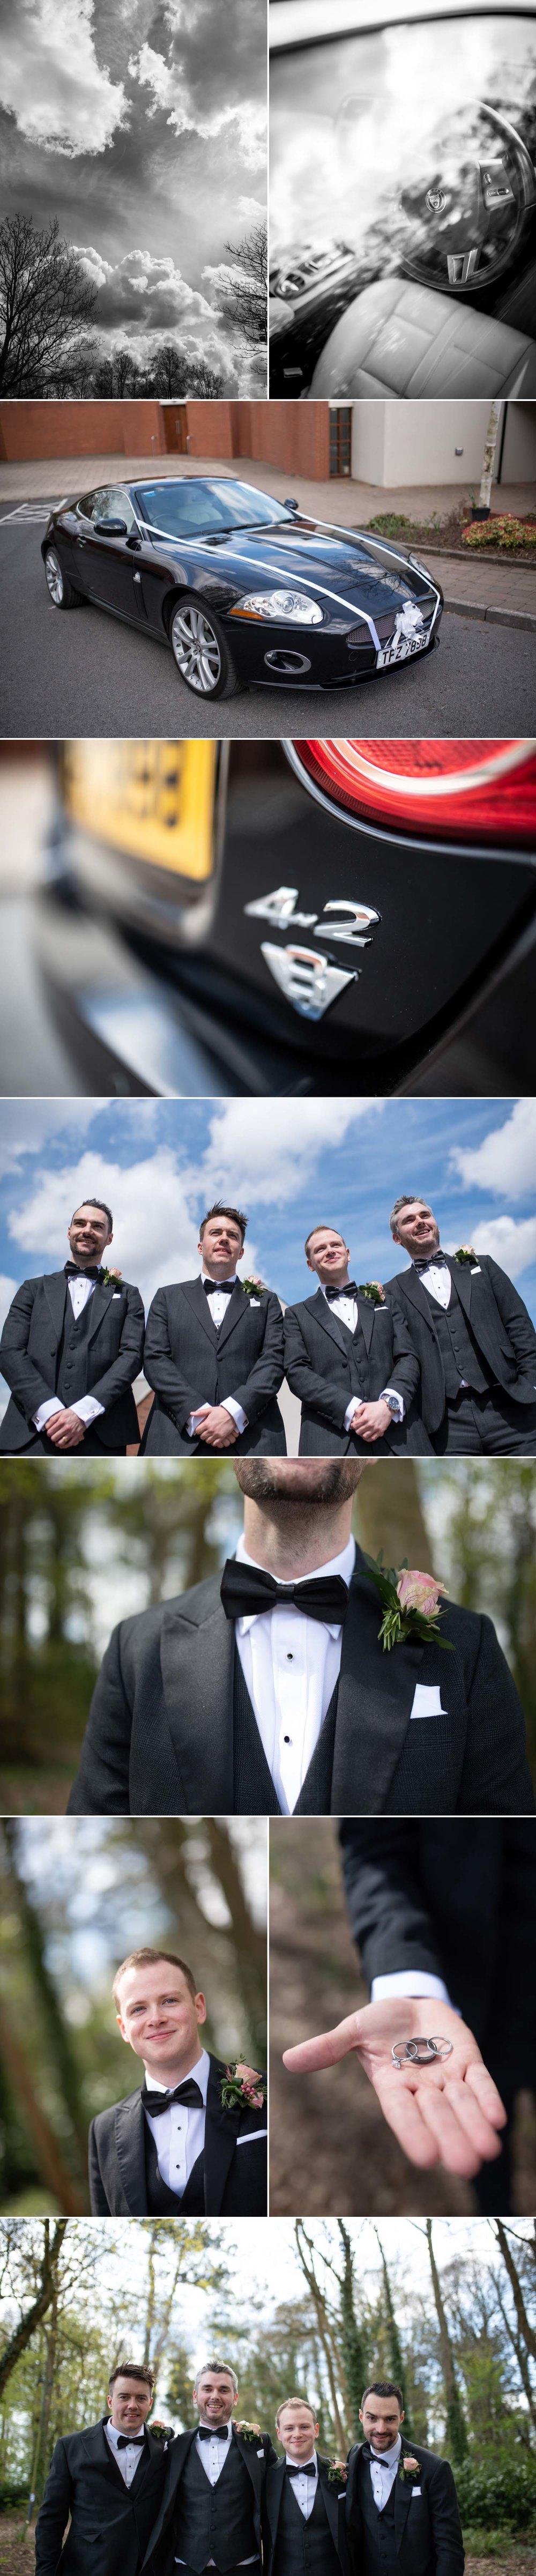 Merchant Hotel Belfast Wedding Photography James McGrillis 06.jpg